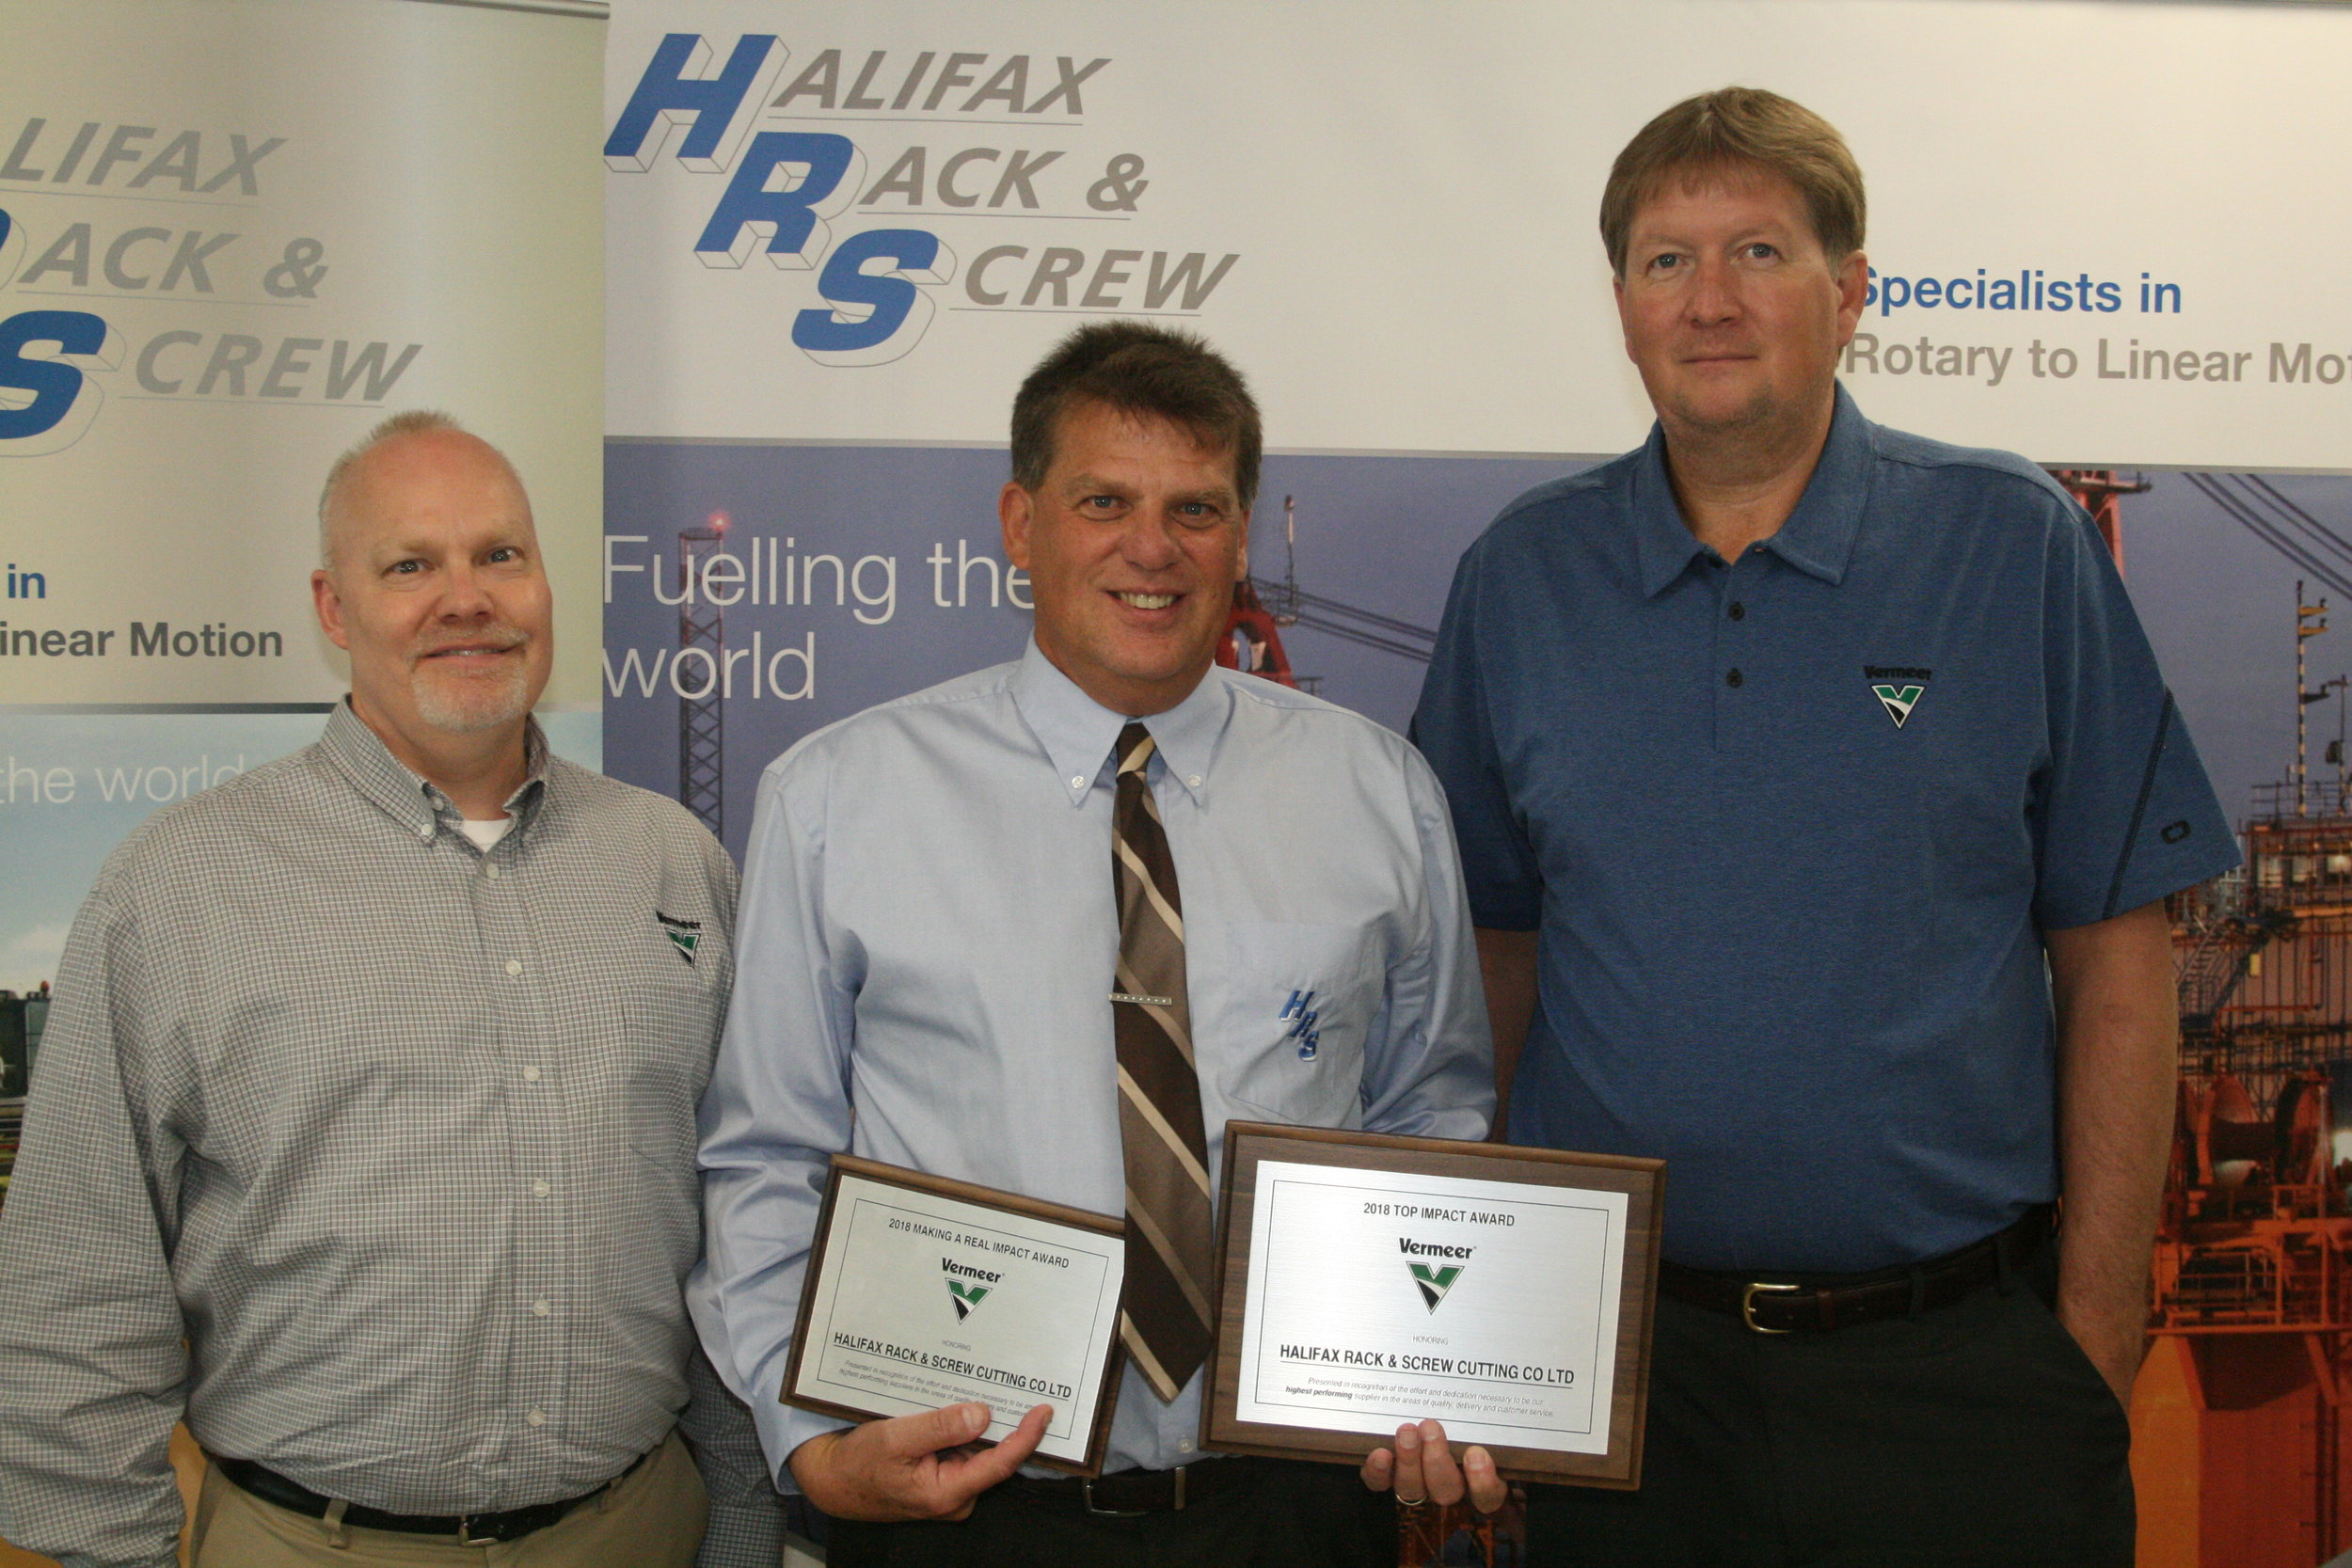 Rich Easley (Middle) HRS North American Business and Sales Manager, Jeremy Vande Noord (Left) Vermeer, Scott Bishop (Right) Vermeer.